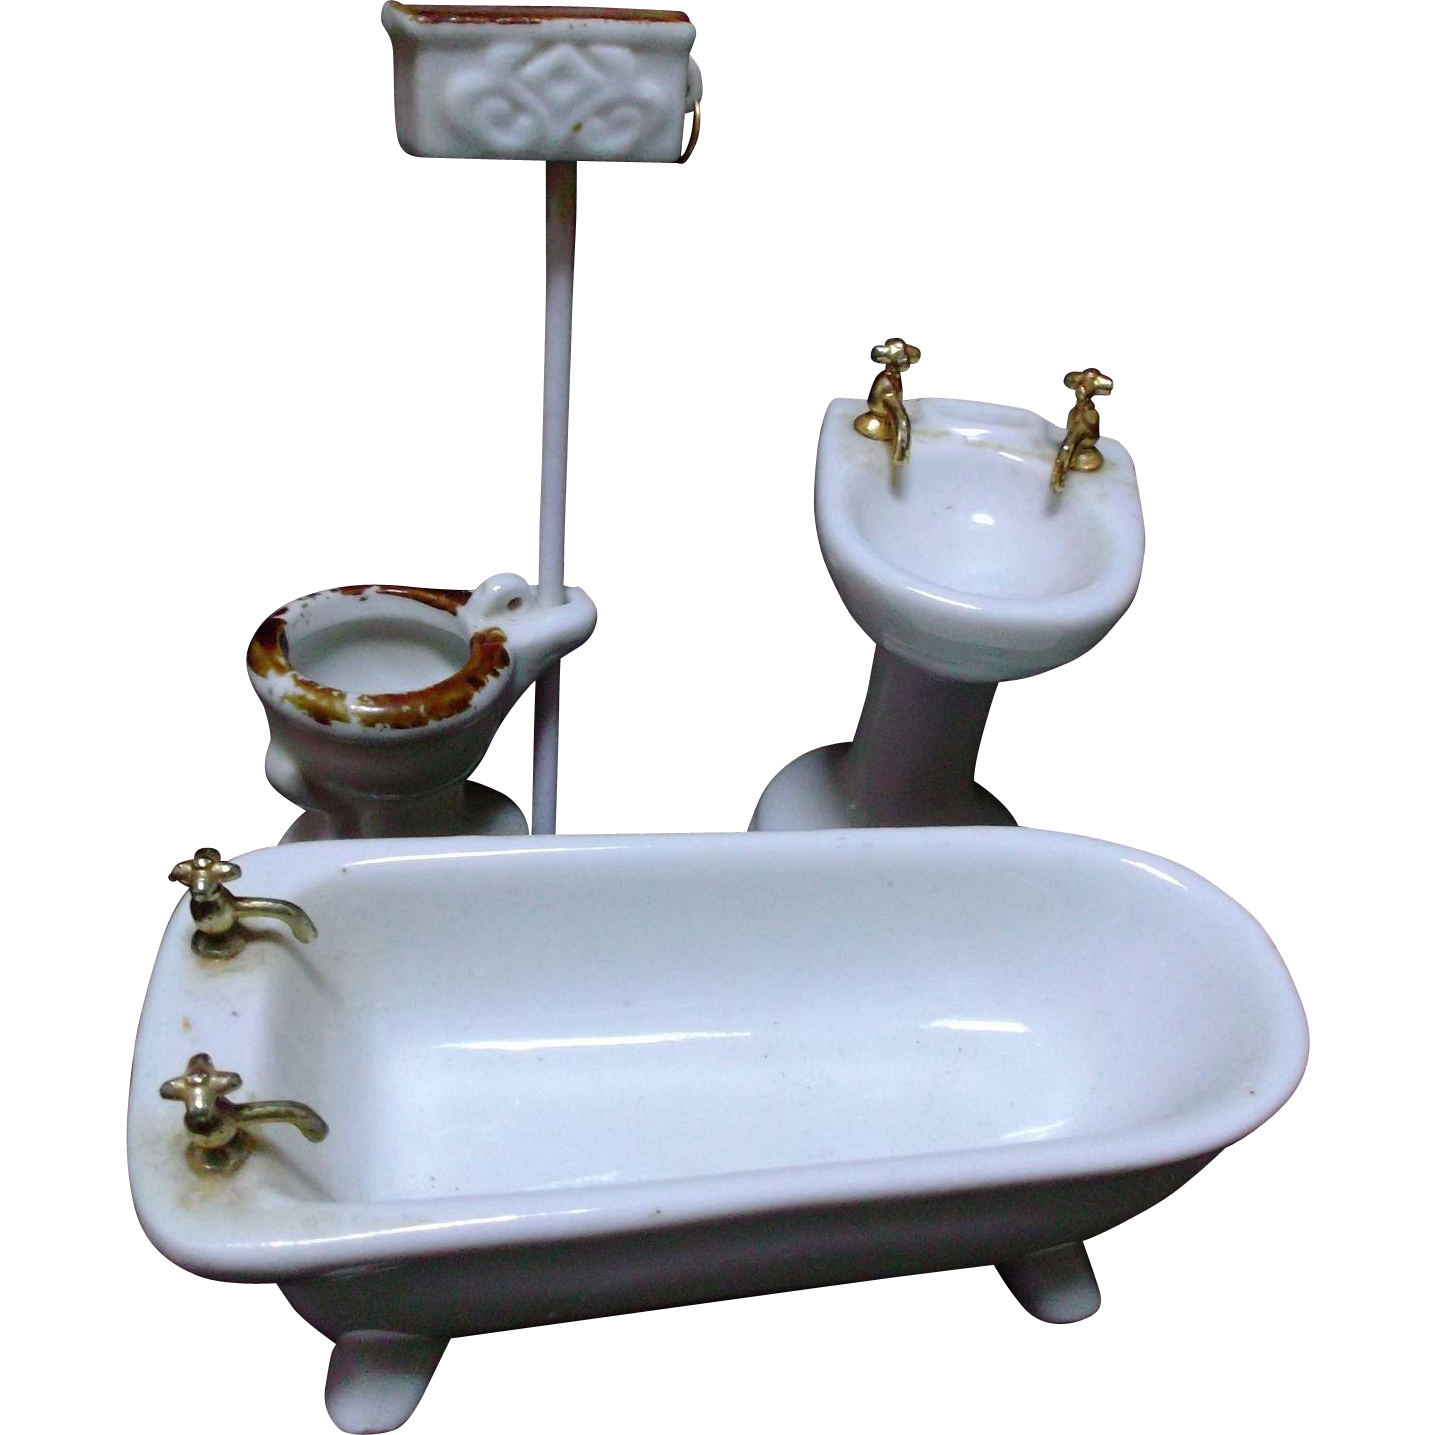 Vintage Porcelain Ceramic Bathroom Fixtures Tub Sink Toilet Doll House Sold On Ruby Lane